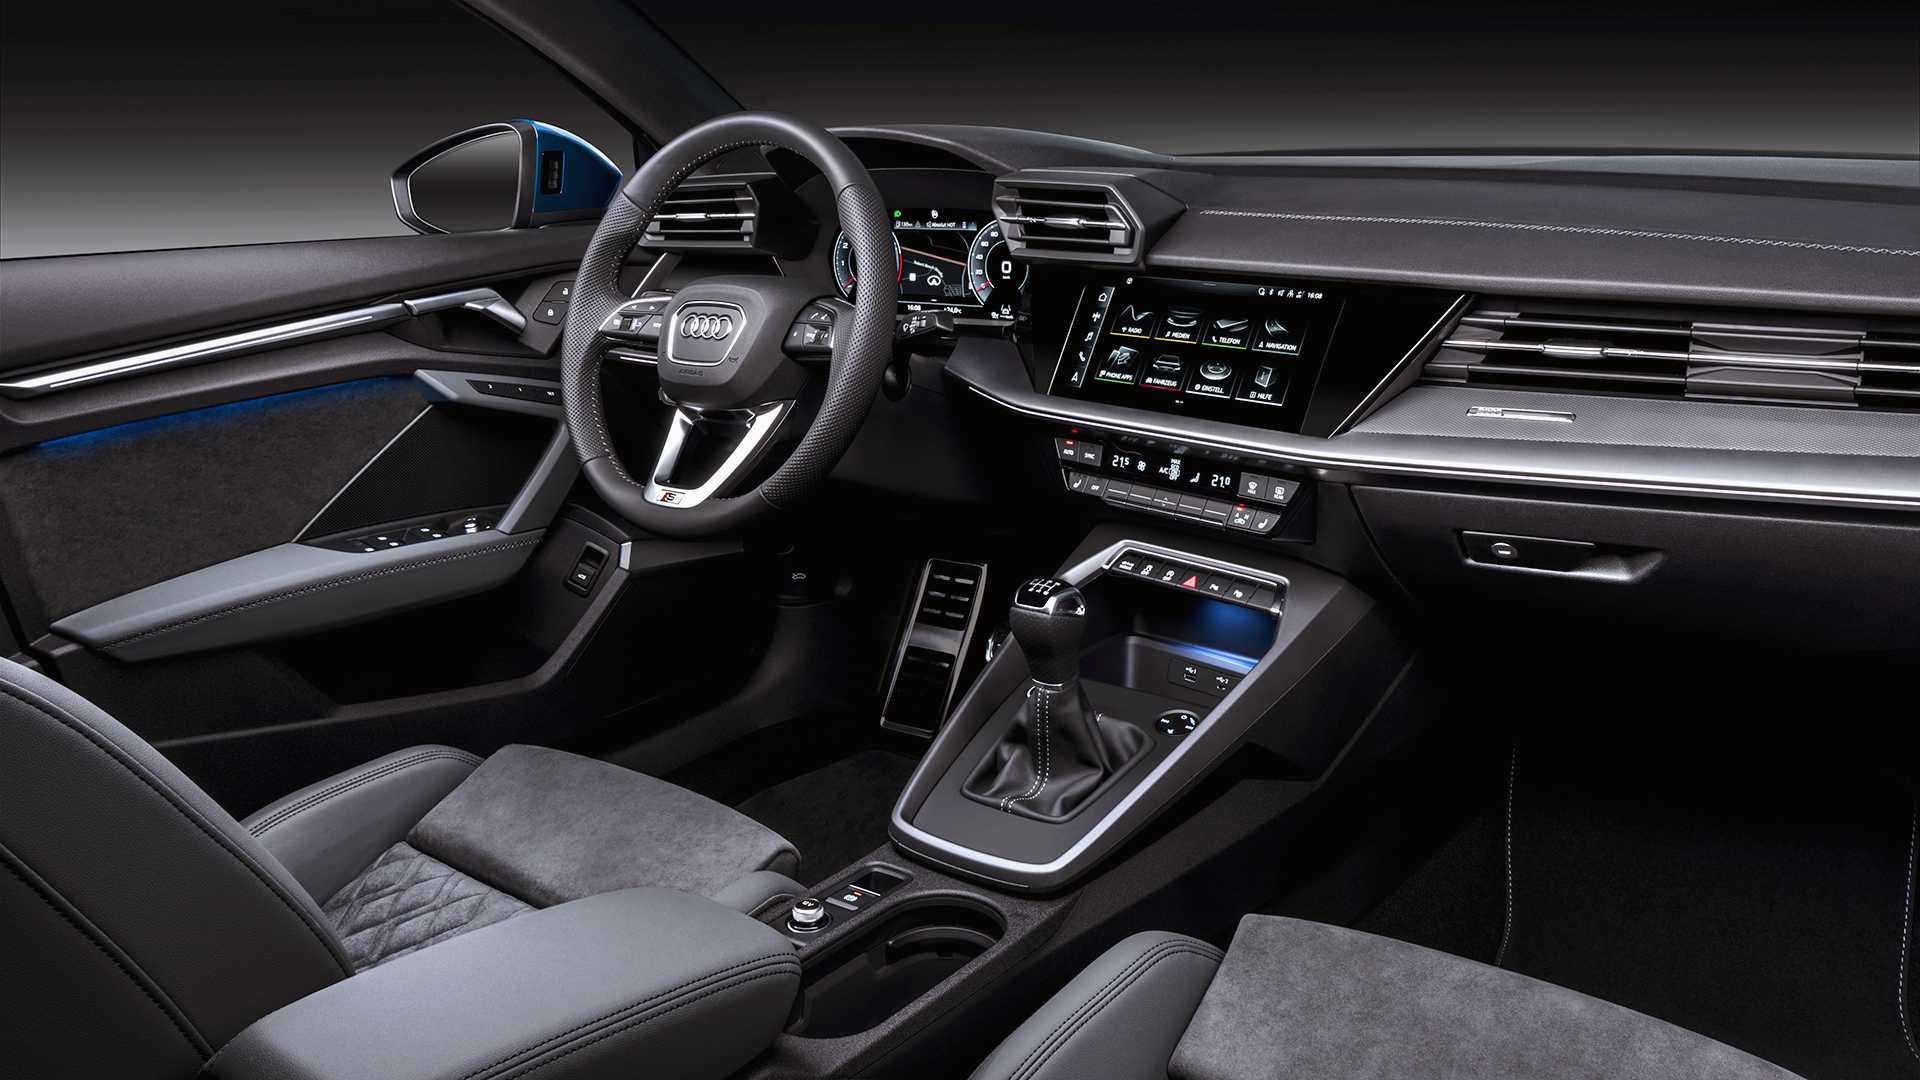 The 2020 Audi Rs 3 Nardo Edition Is Faster Than Standard Rs 3 Sedan Autoevolution